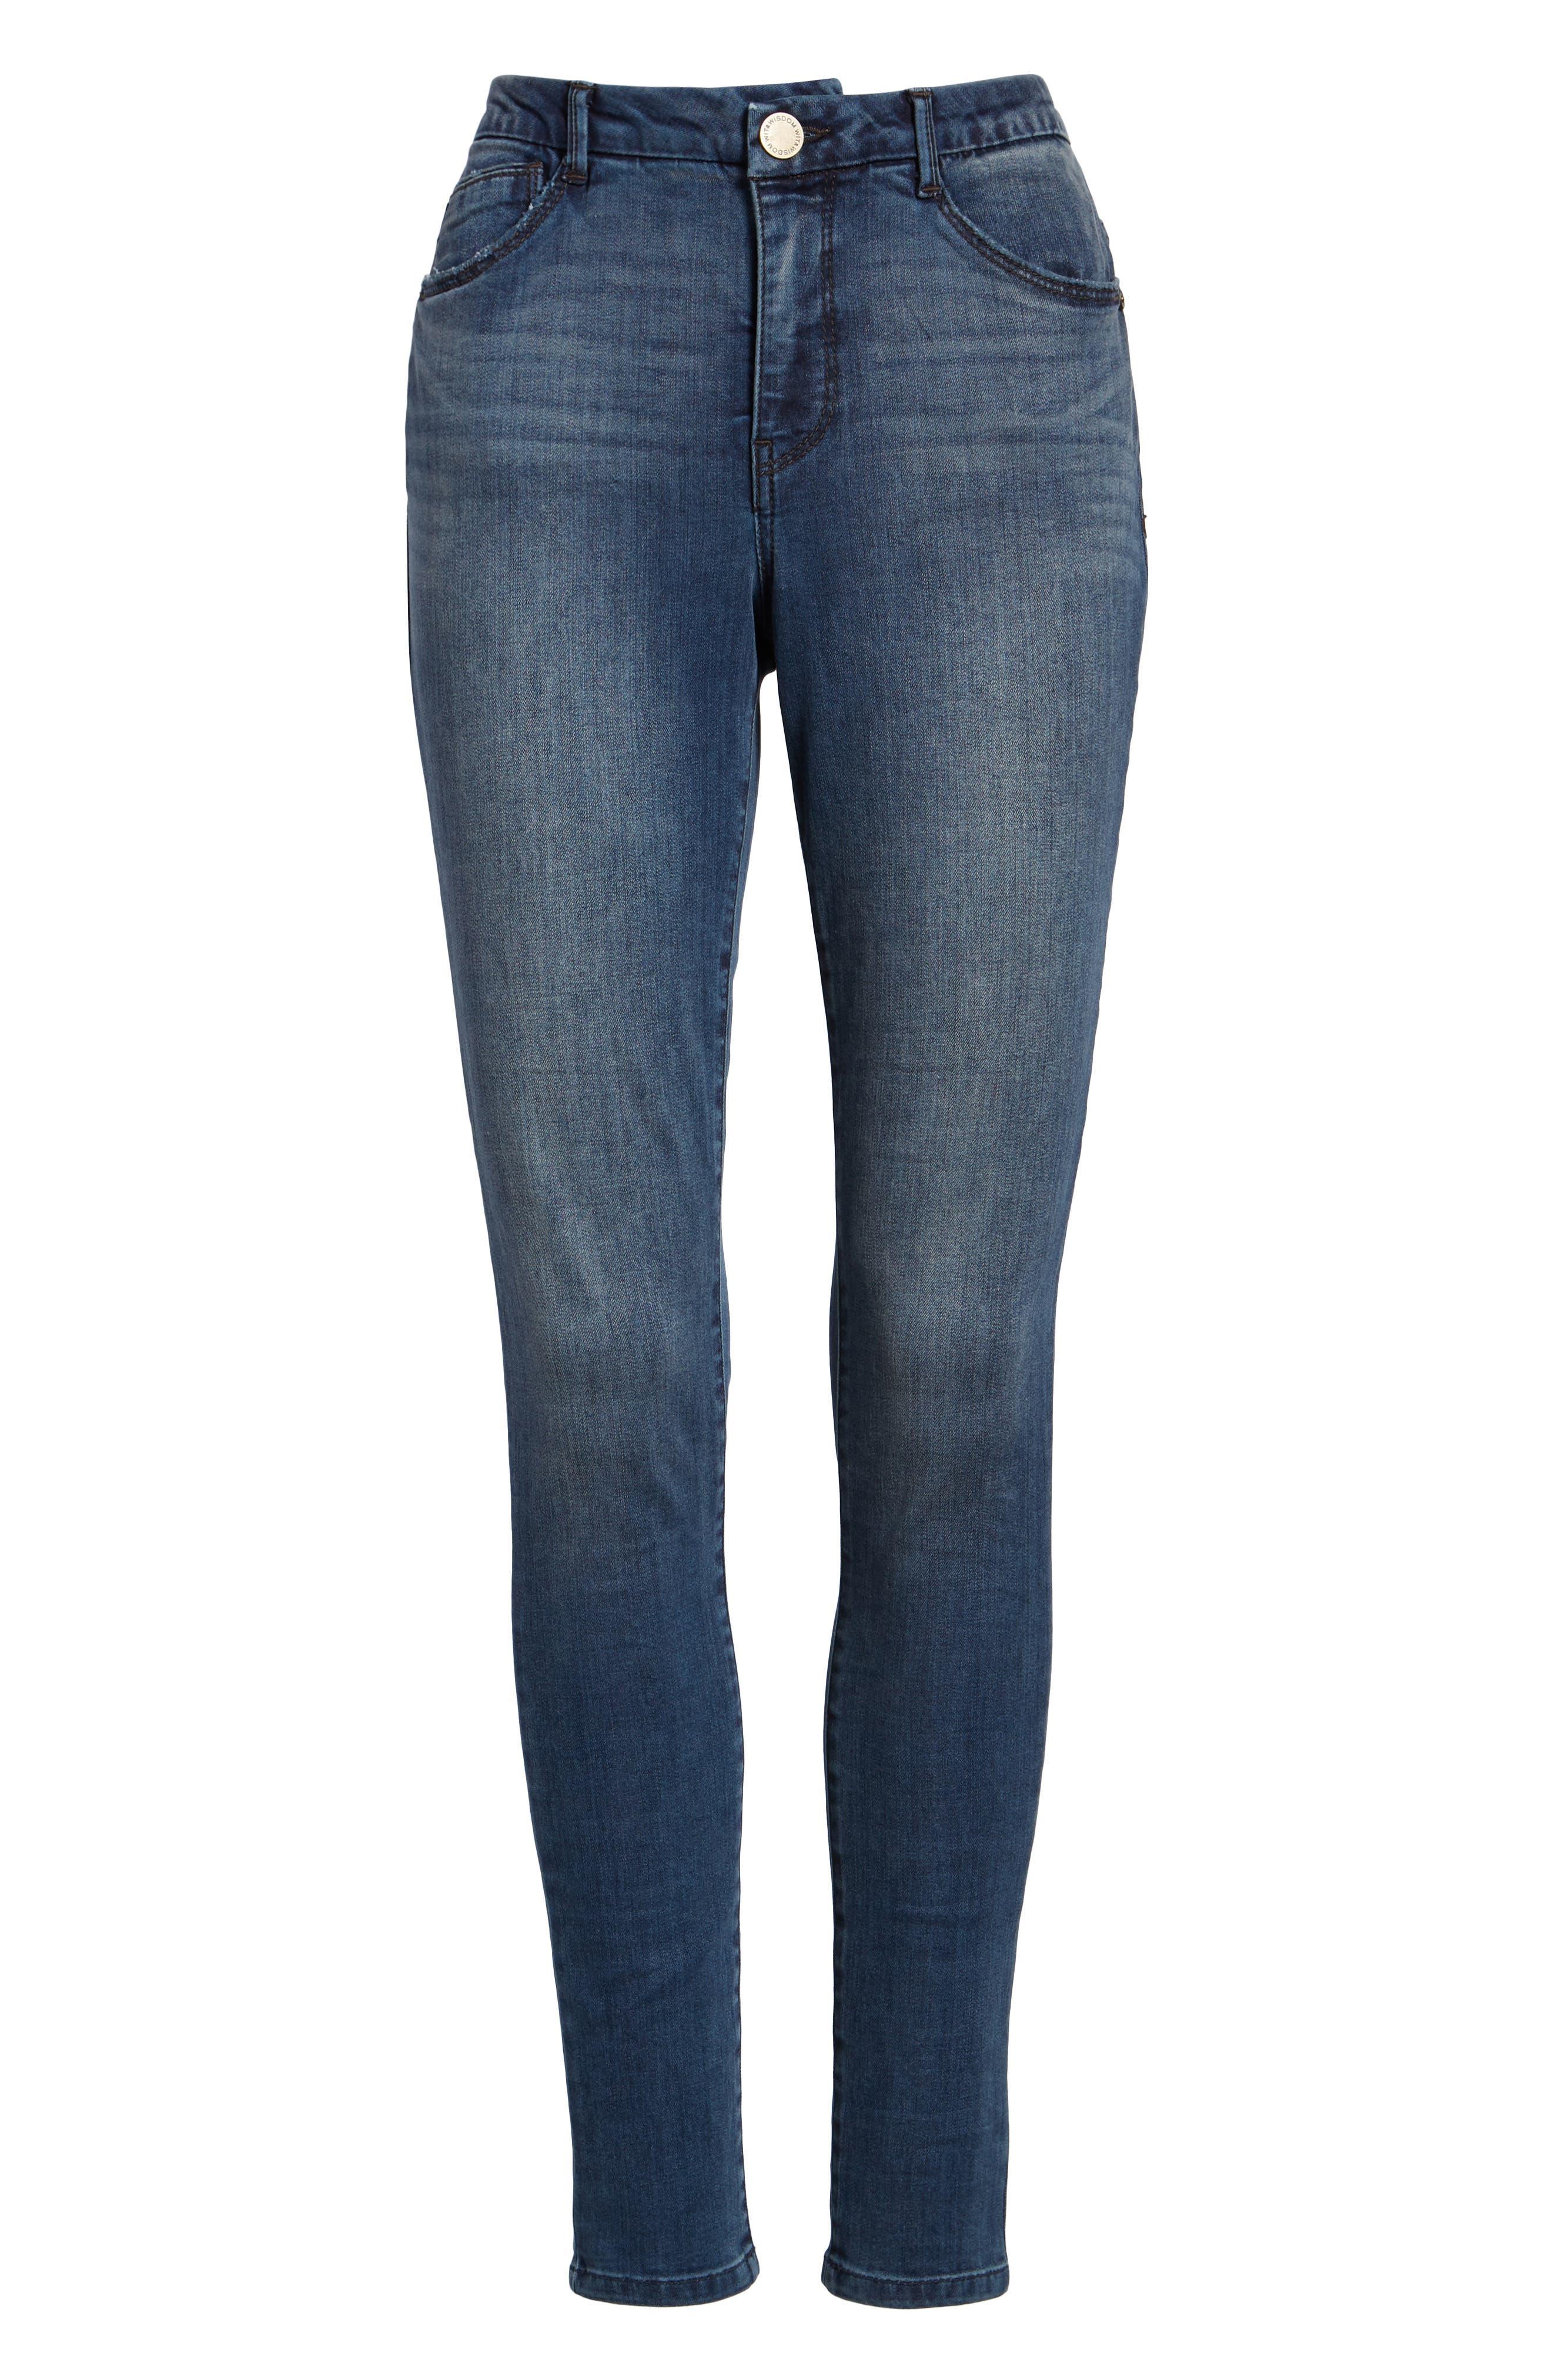 Ab-Solution High Waist Skinny Jeans,                             Alternate thumbnail 7, color,                             420